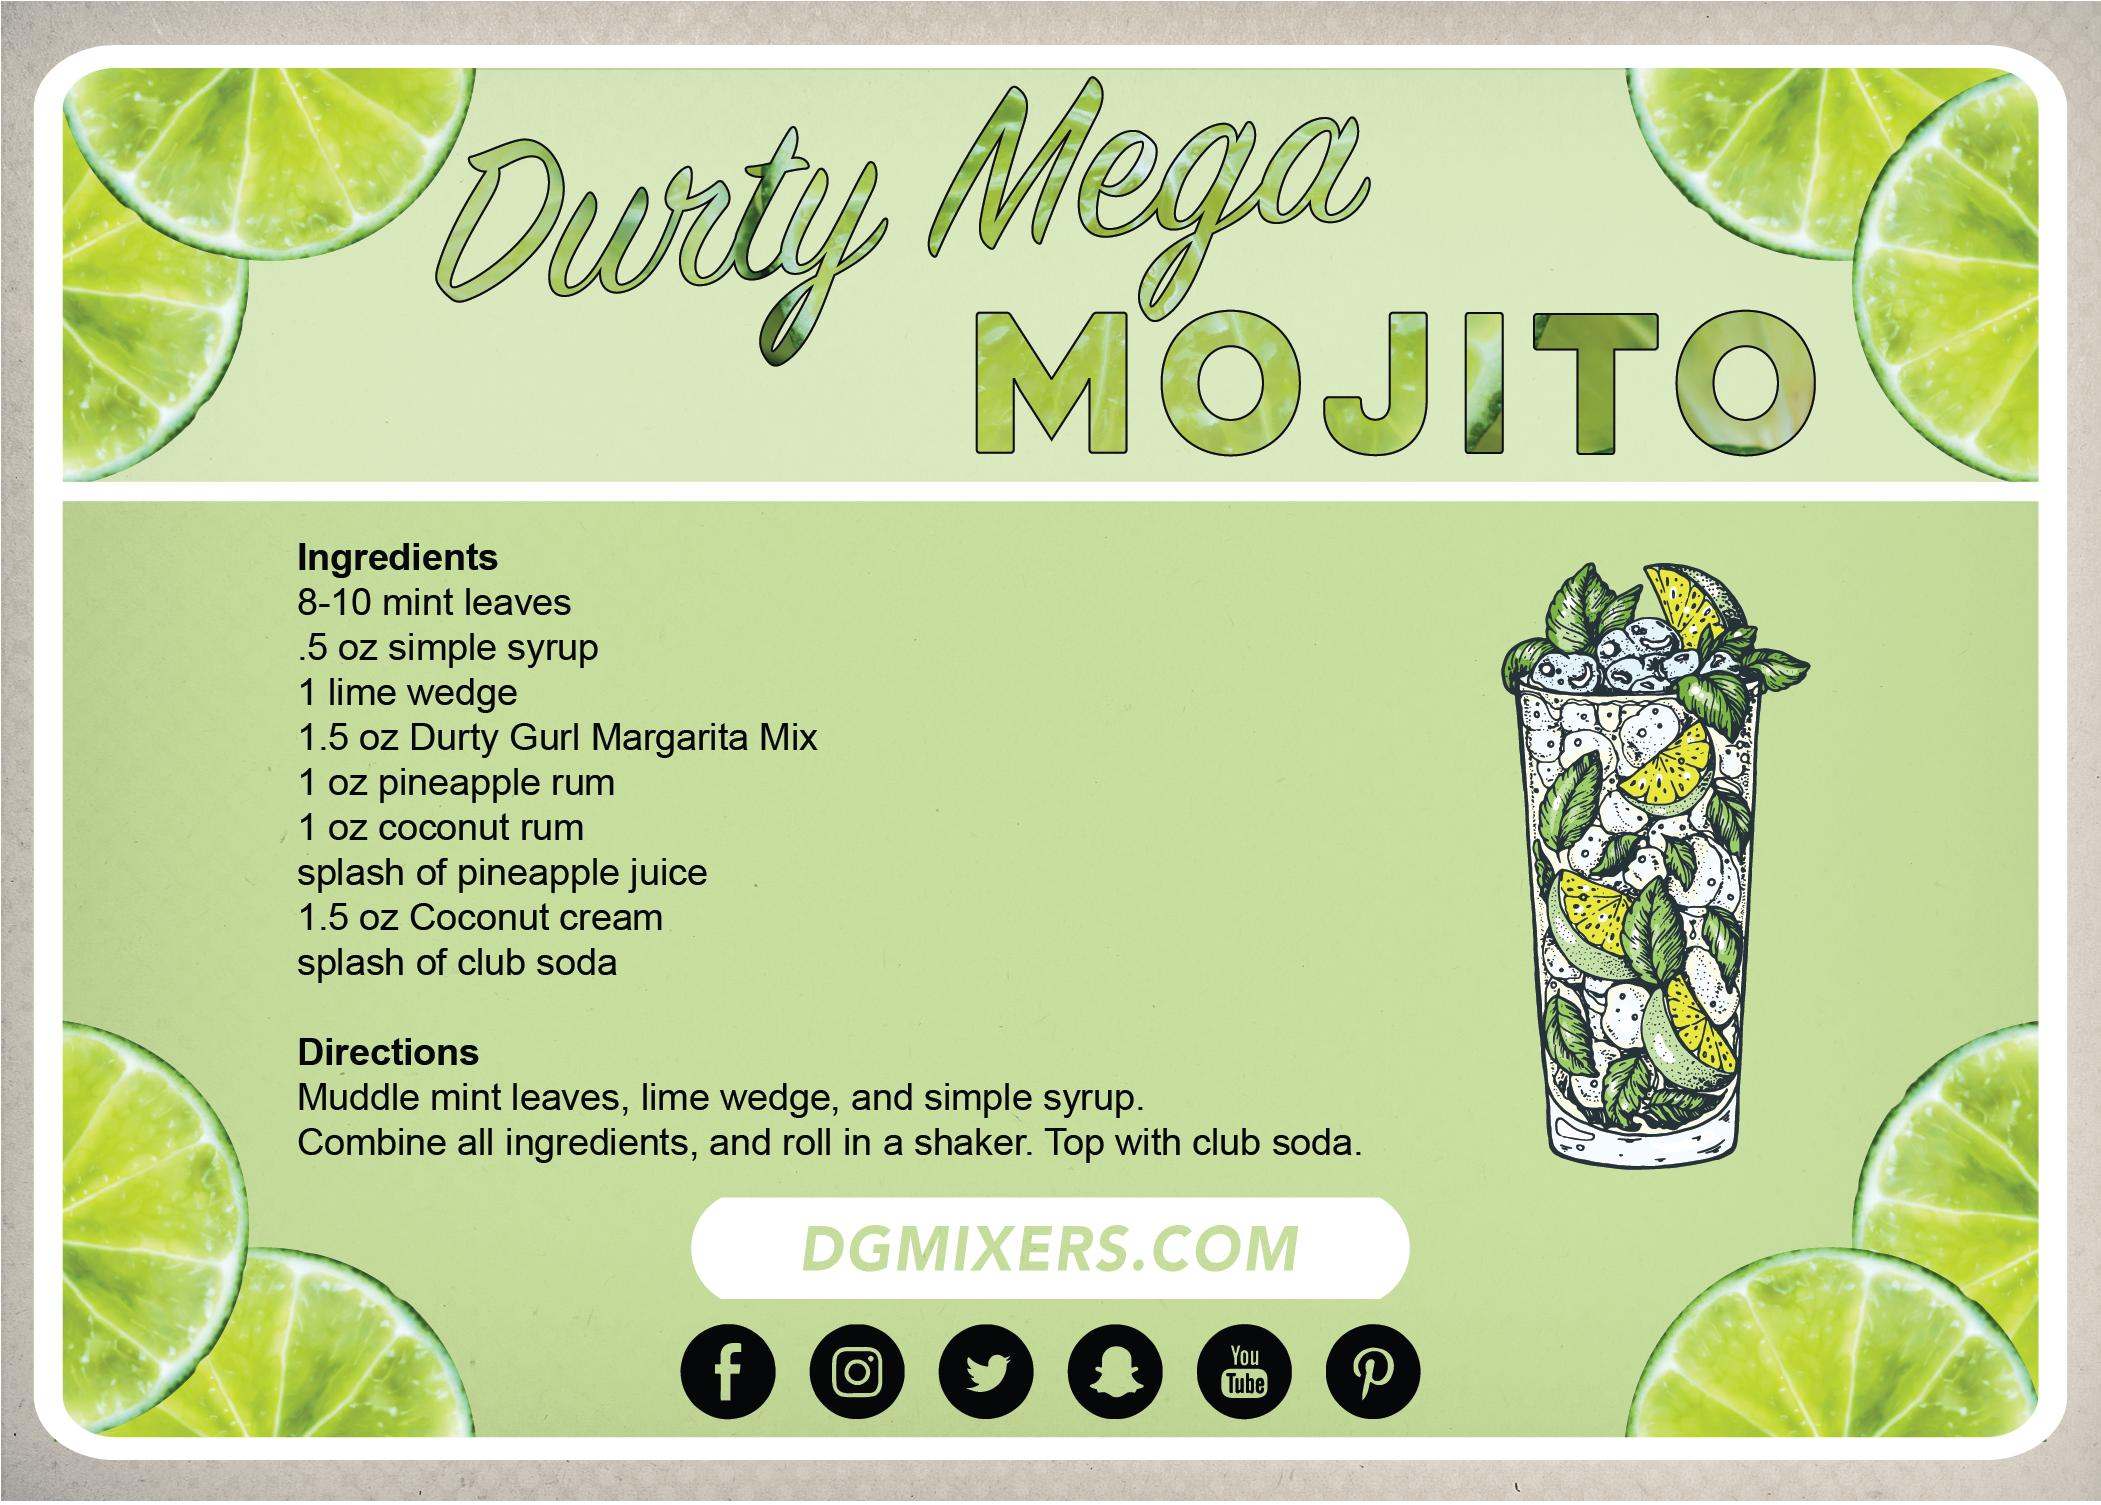 durty mega recipe card-02.png